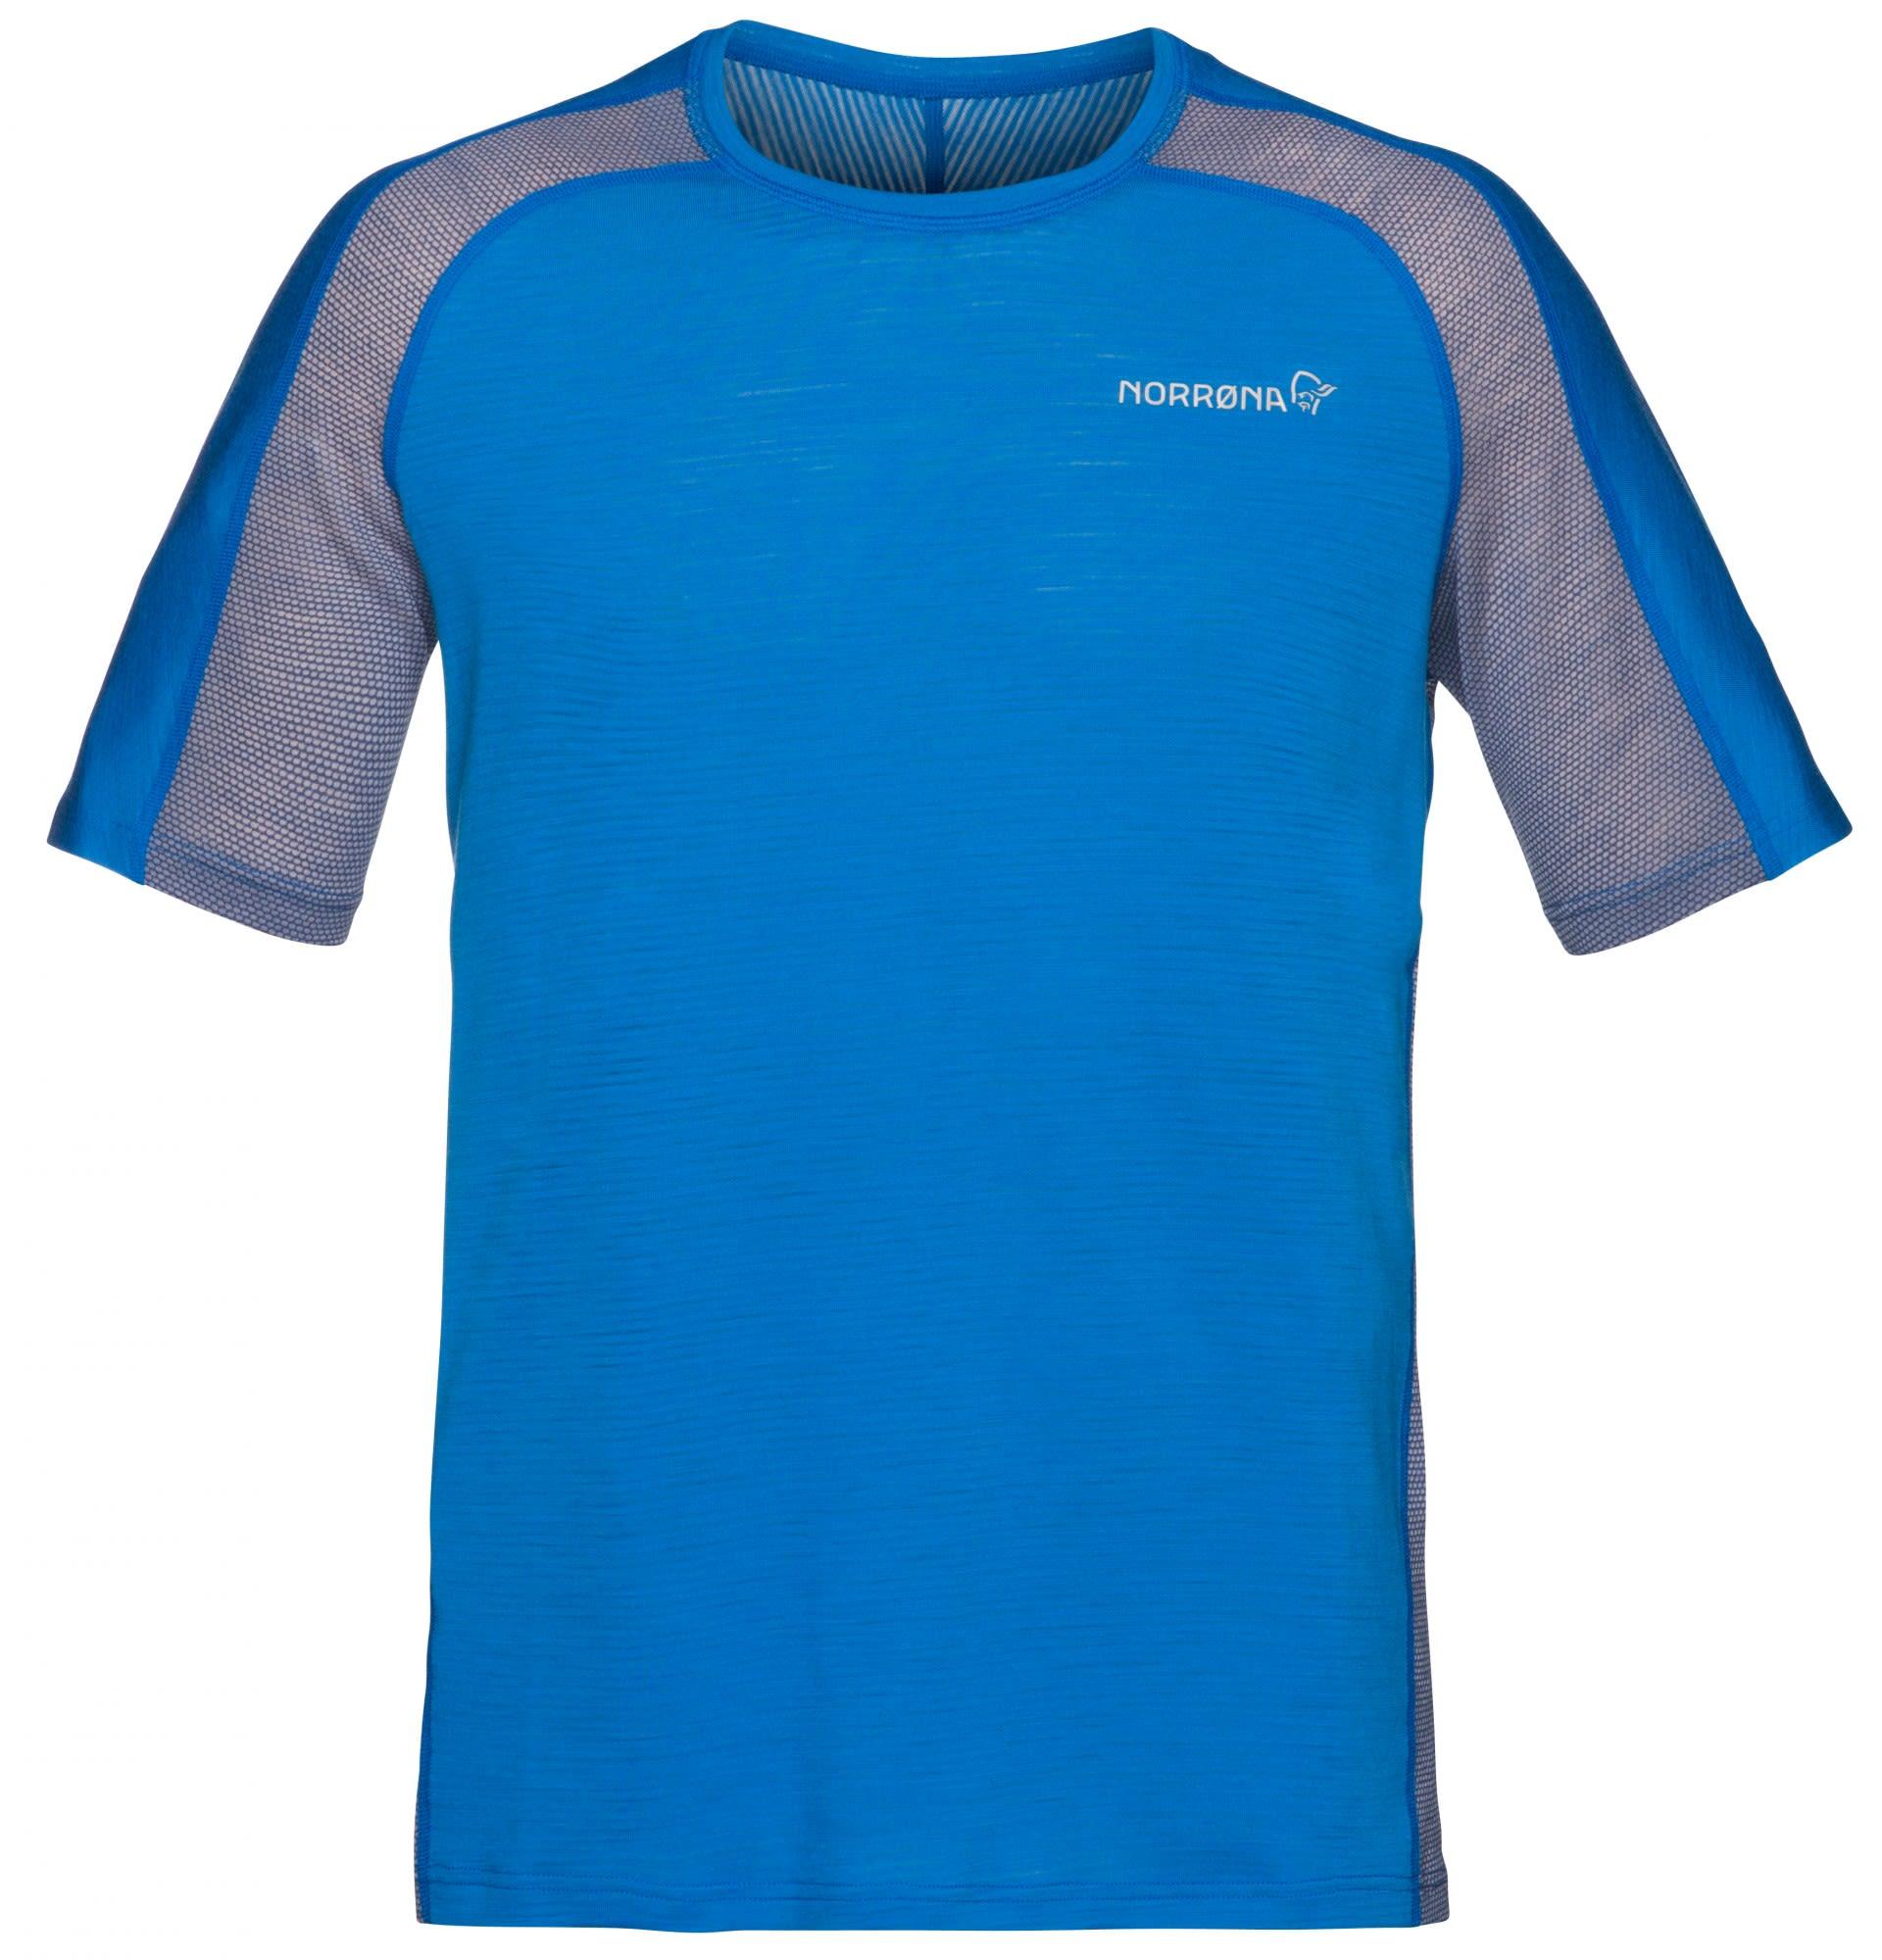 Norrona Bitihorn Wool T-Shirt Blau, Male Merino S -Farbe Hot Sapphire, S